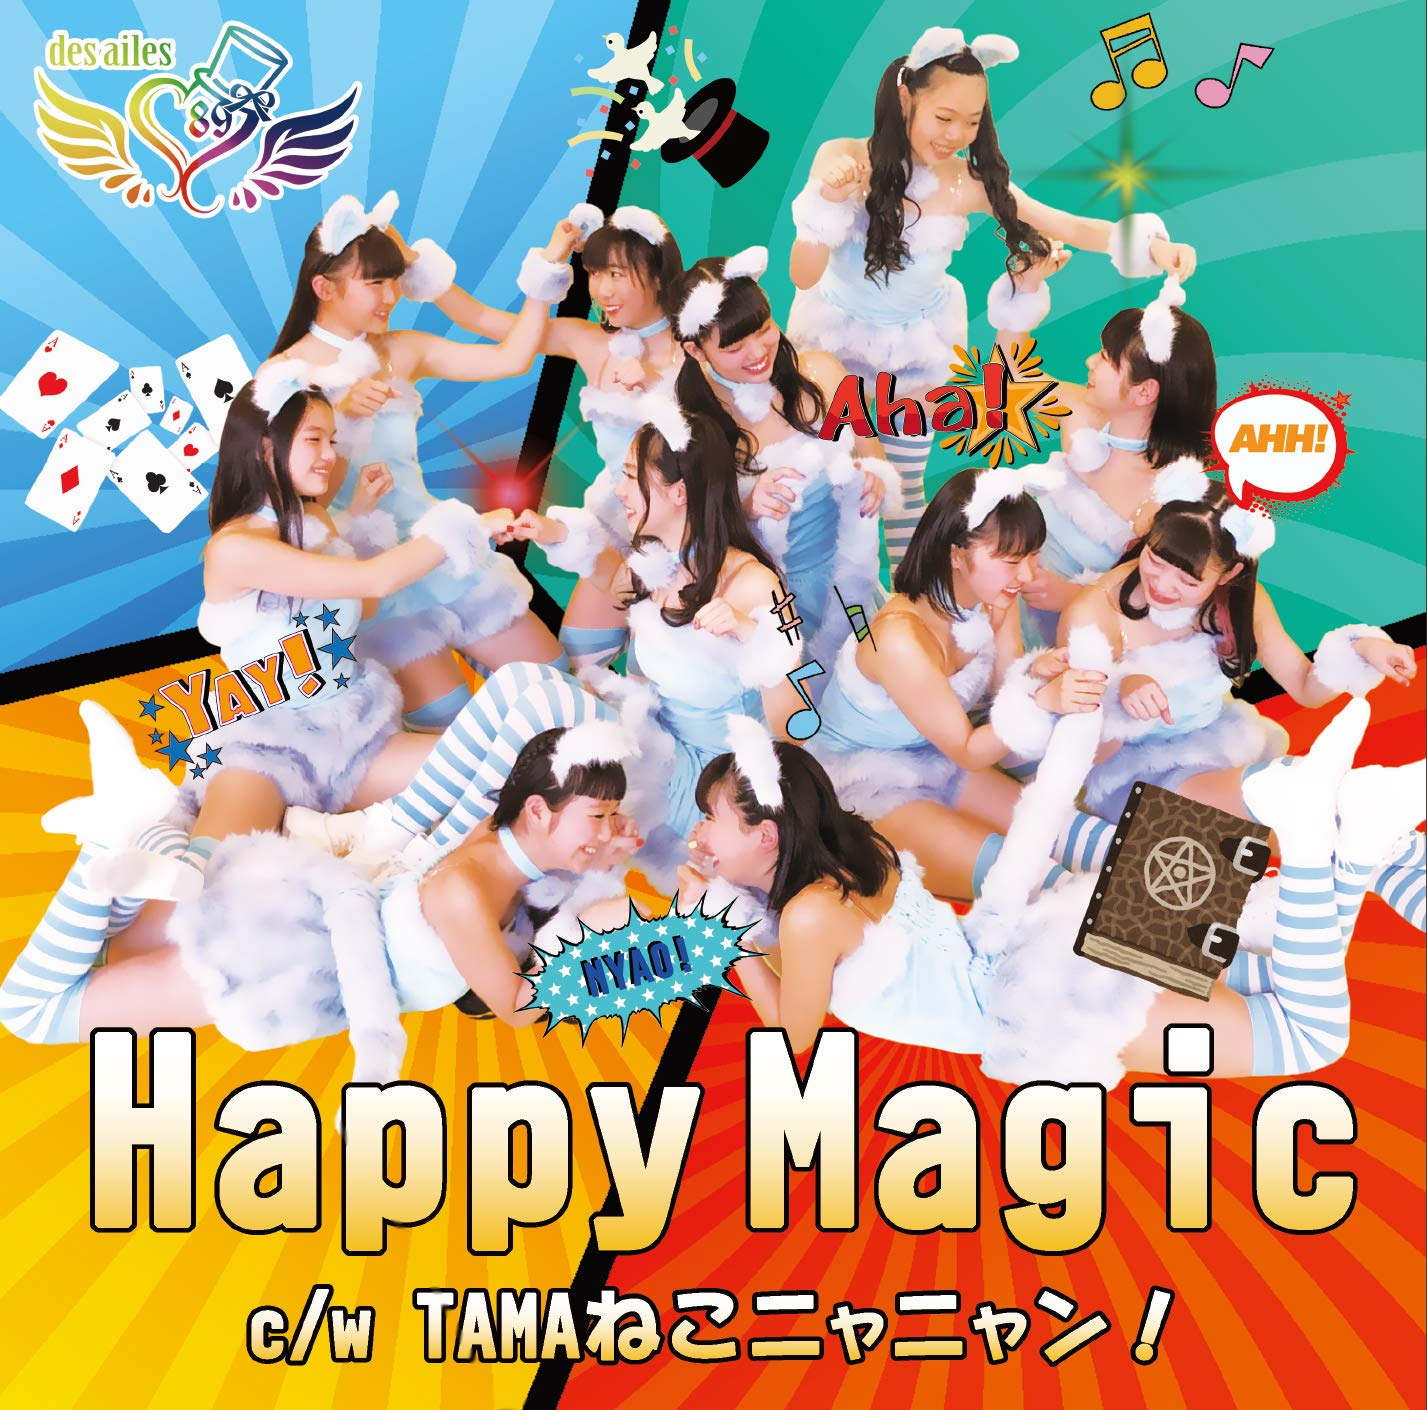 Happy Magic / TAMA Neko Nya Nyan!